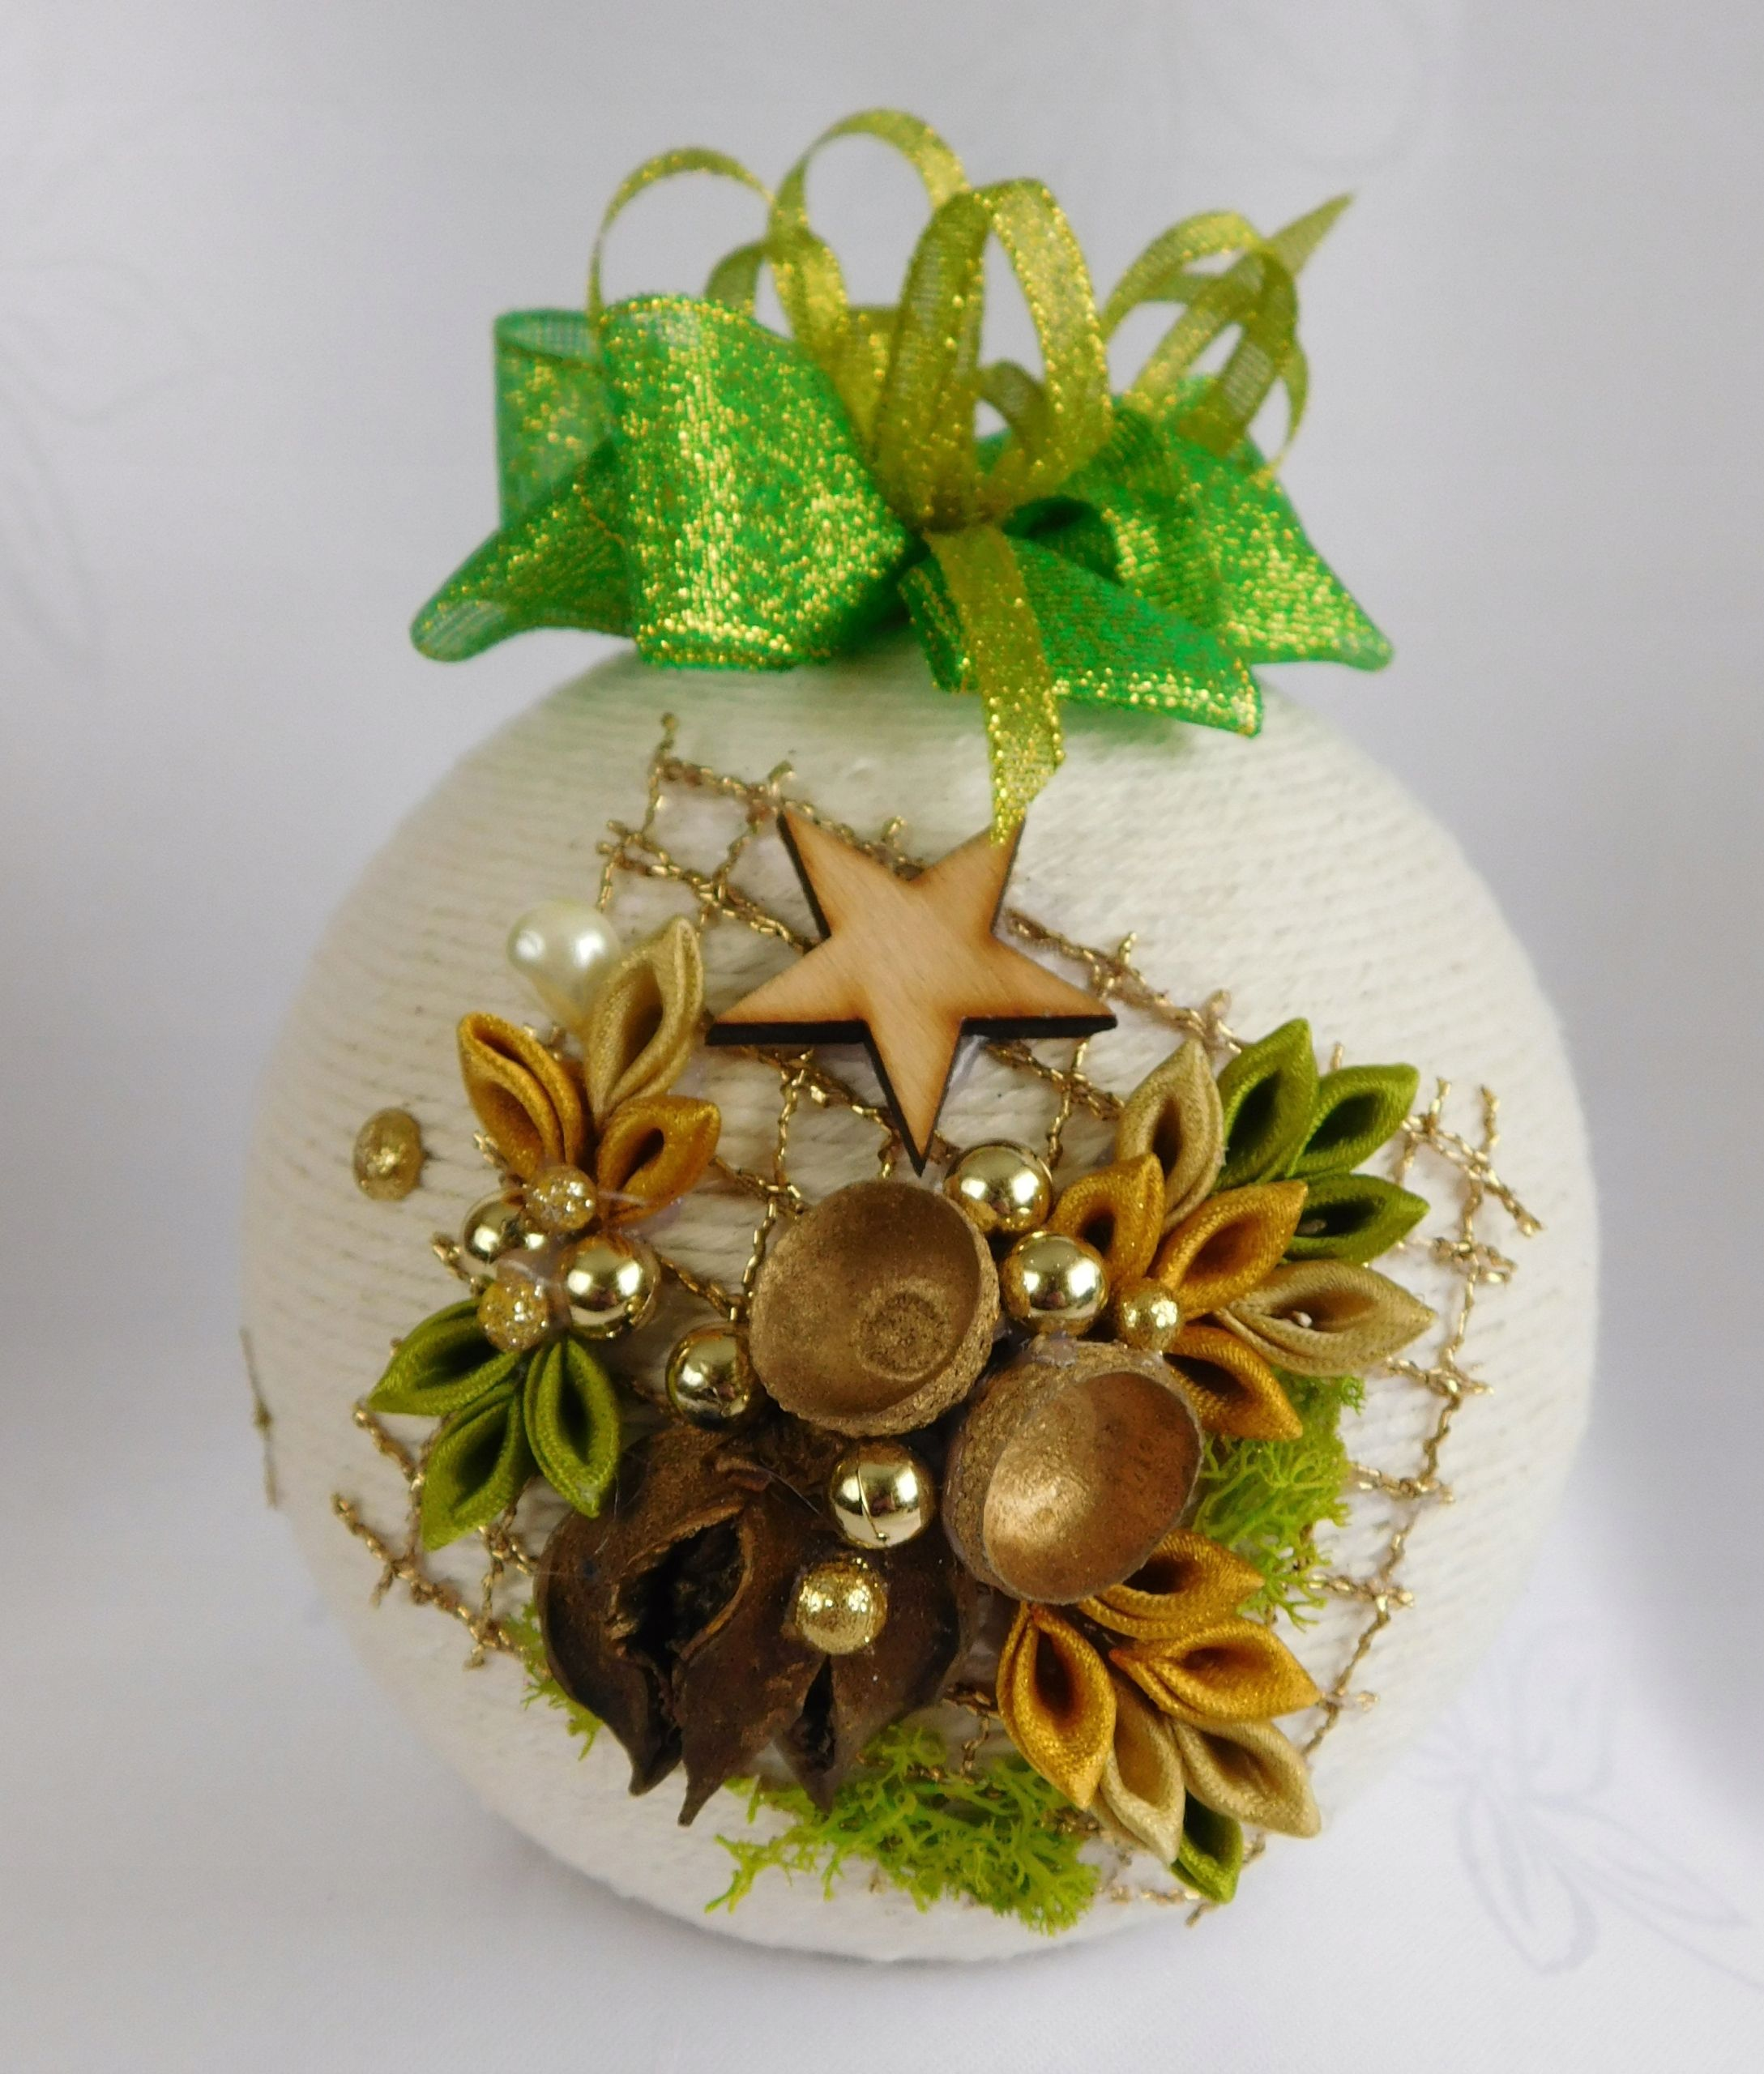 Kup Teraz Na Allegro Pl Za 25 00 Zl Bombka Sznurkowa Na Choinke Prezent Rekodzielo 8098336105 Allegro Christmas Bulbs Christmas Ornaments Holiday Decor